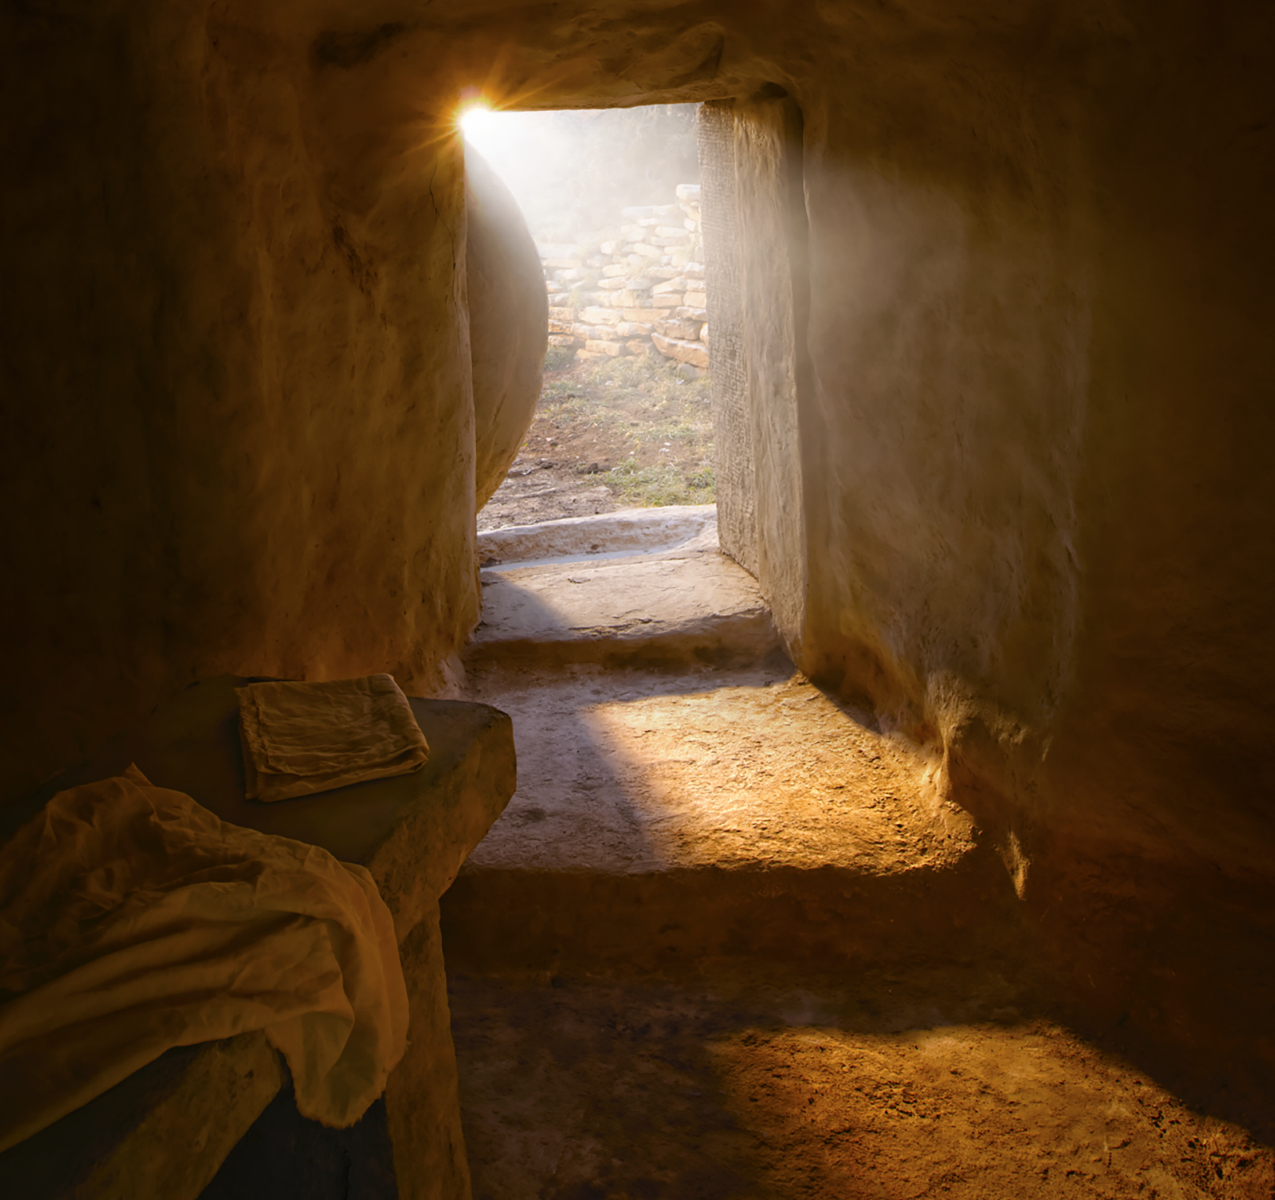 jesus-christ-empty-tomb-goshen-utah-1574